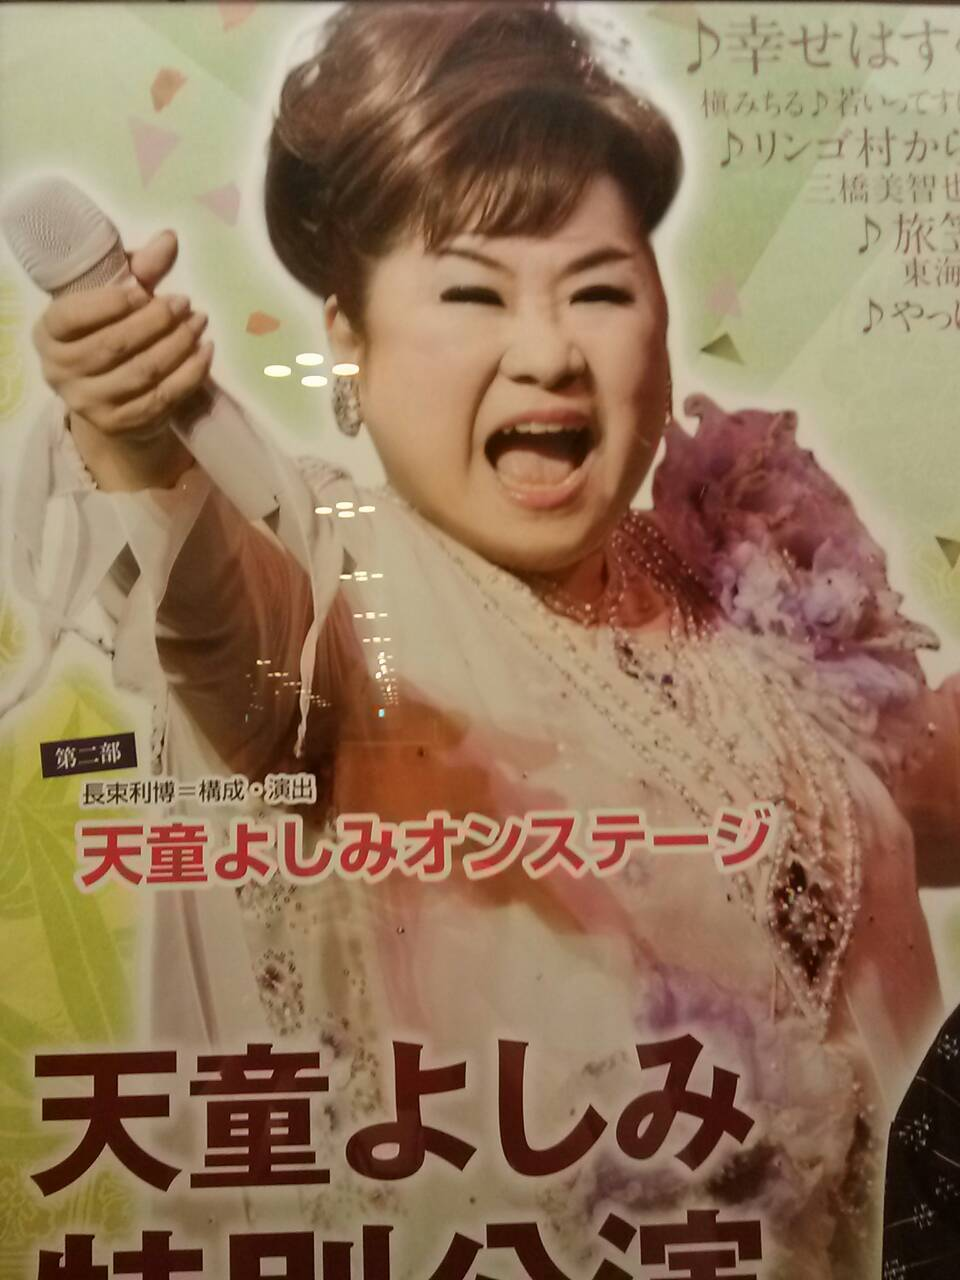 yosimi.jpg